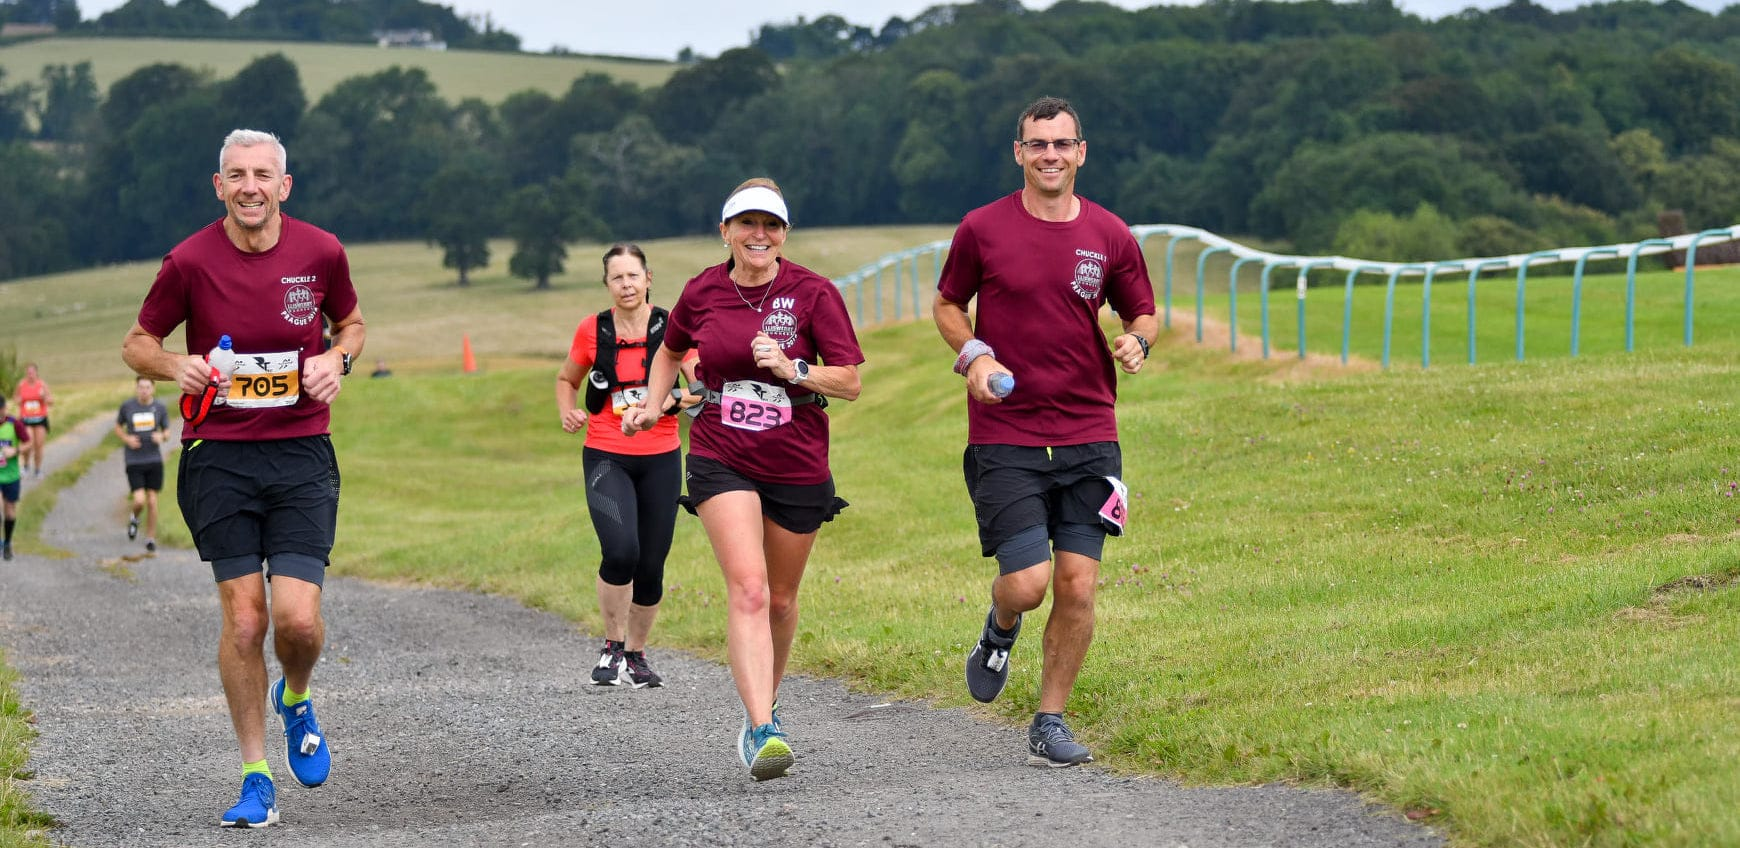 Chepstow Racecourse 5k, 10k & Half Marathon - November